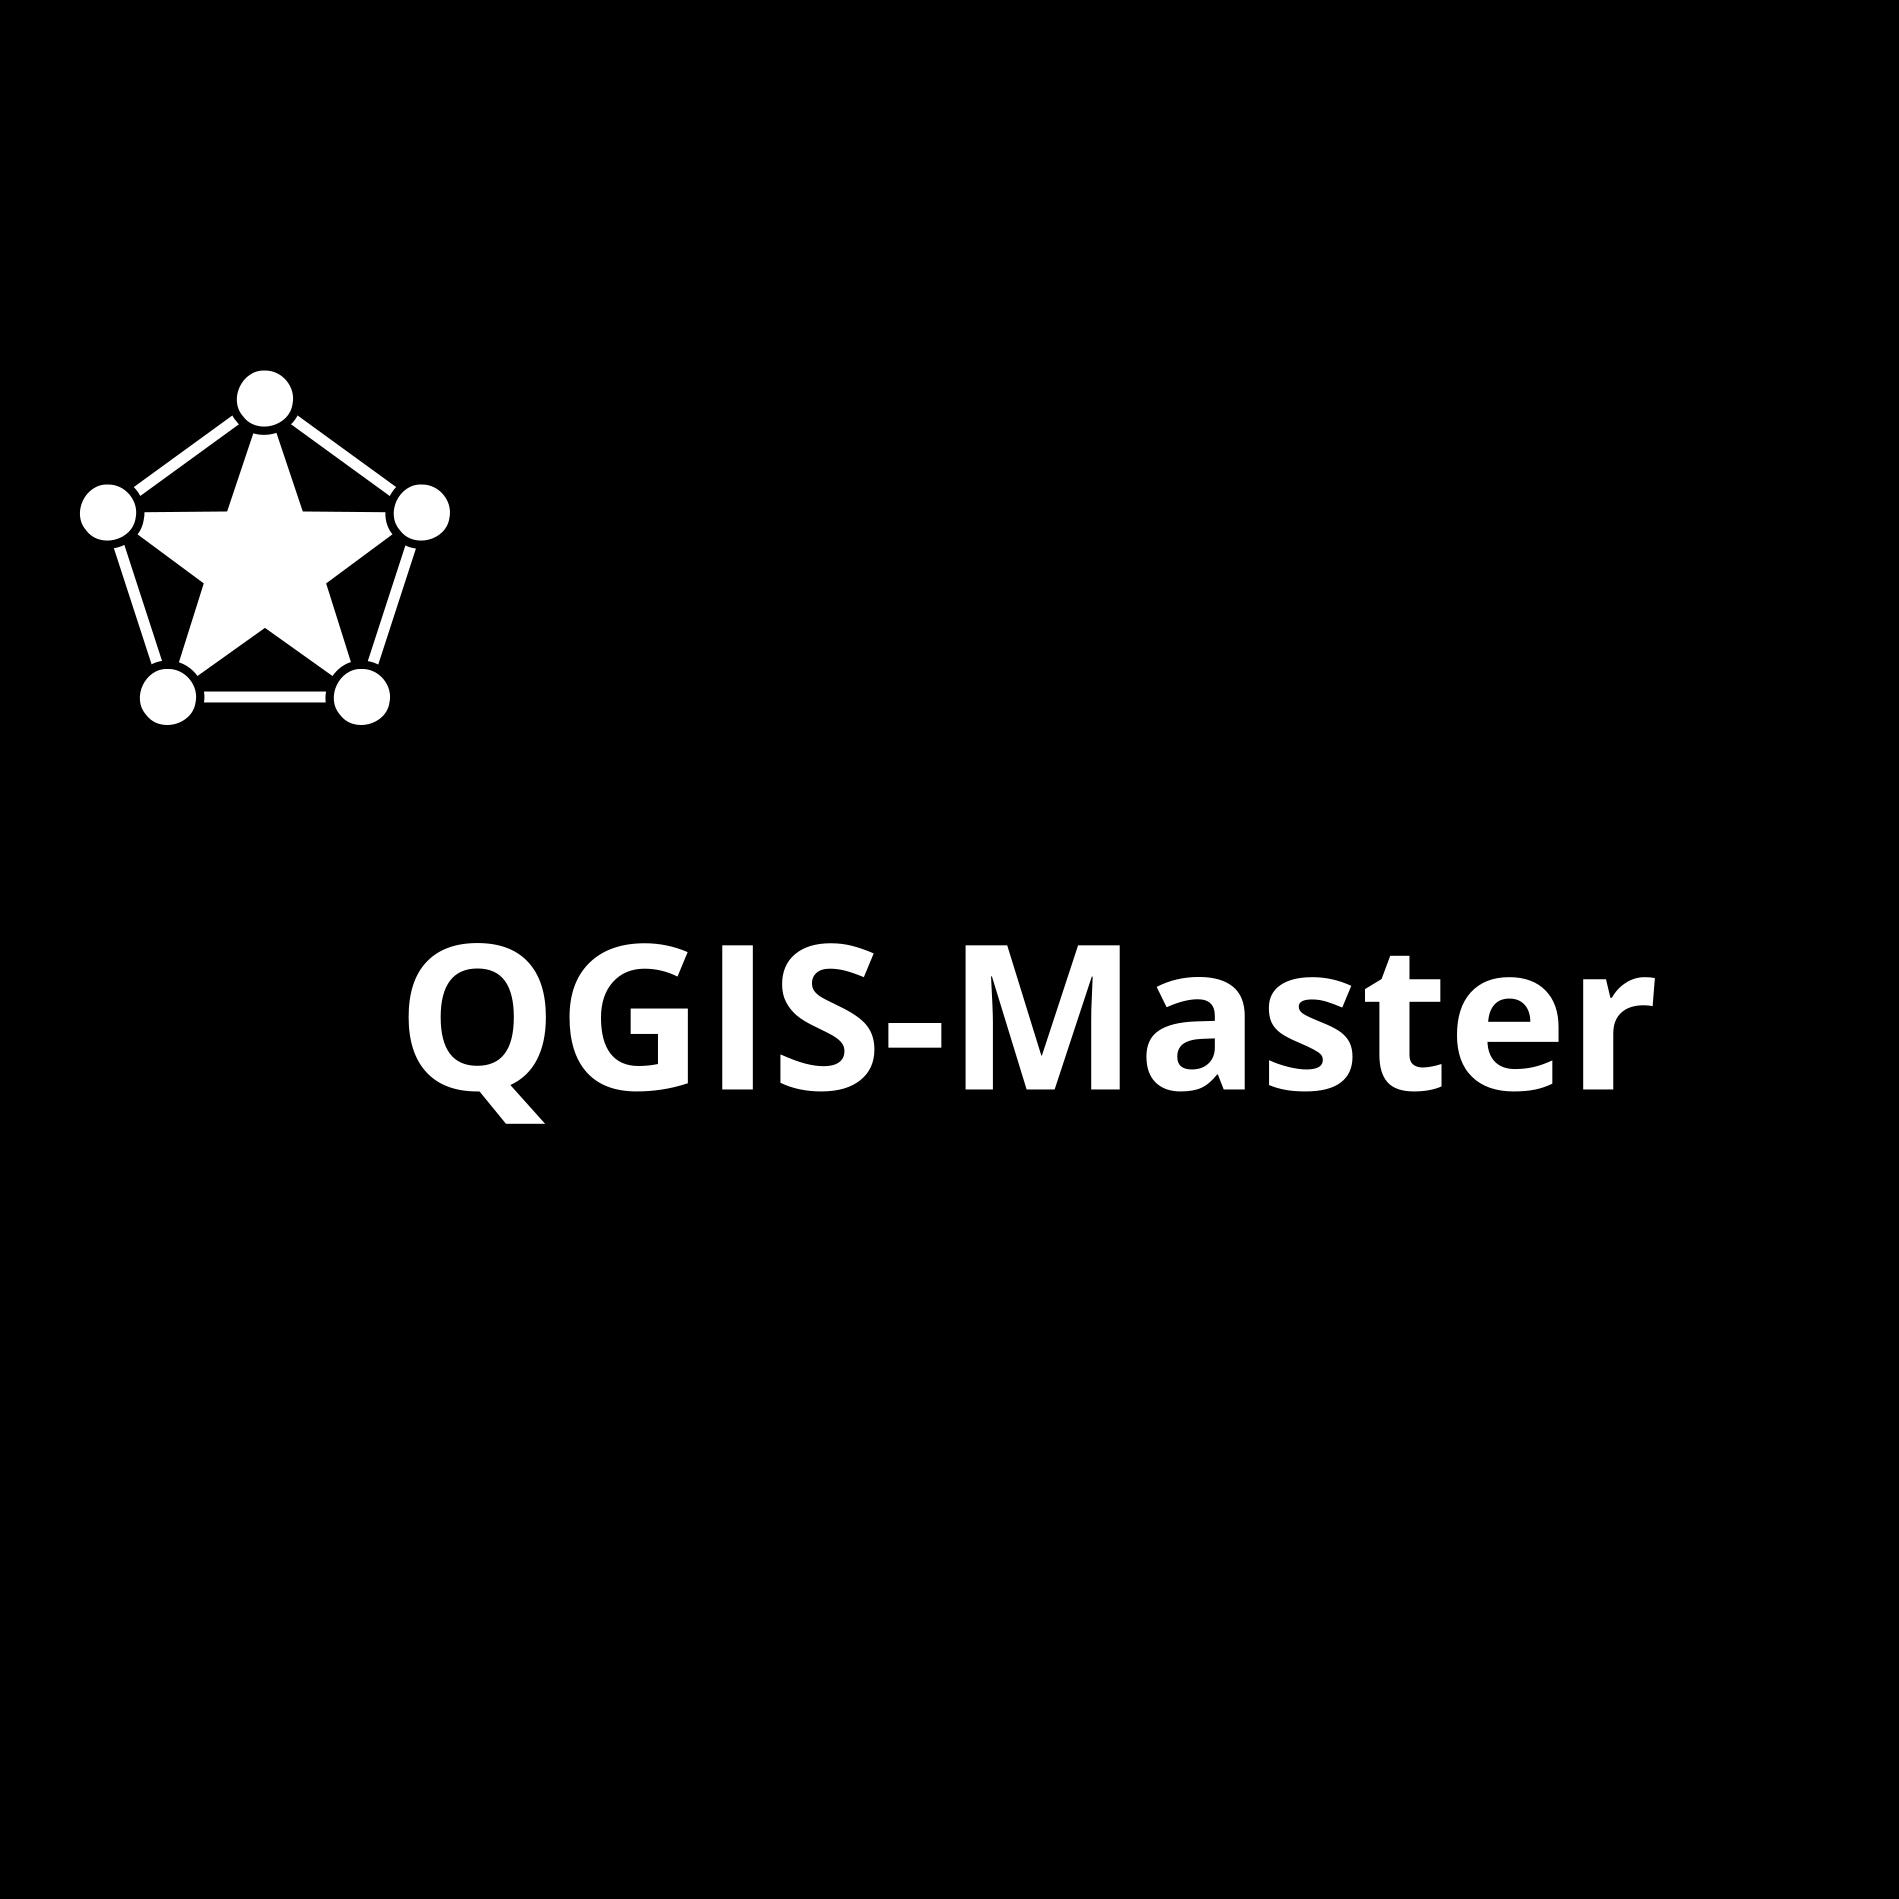 QGISMaster